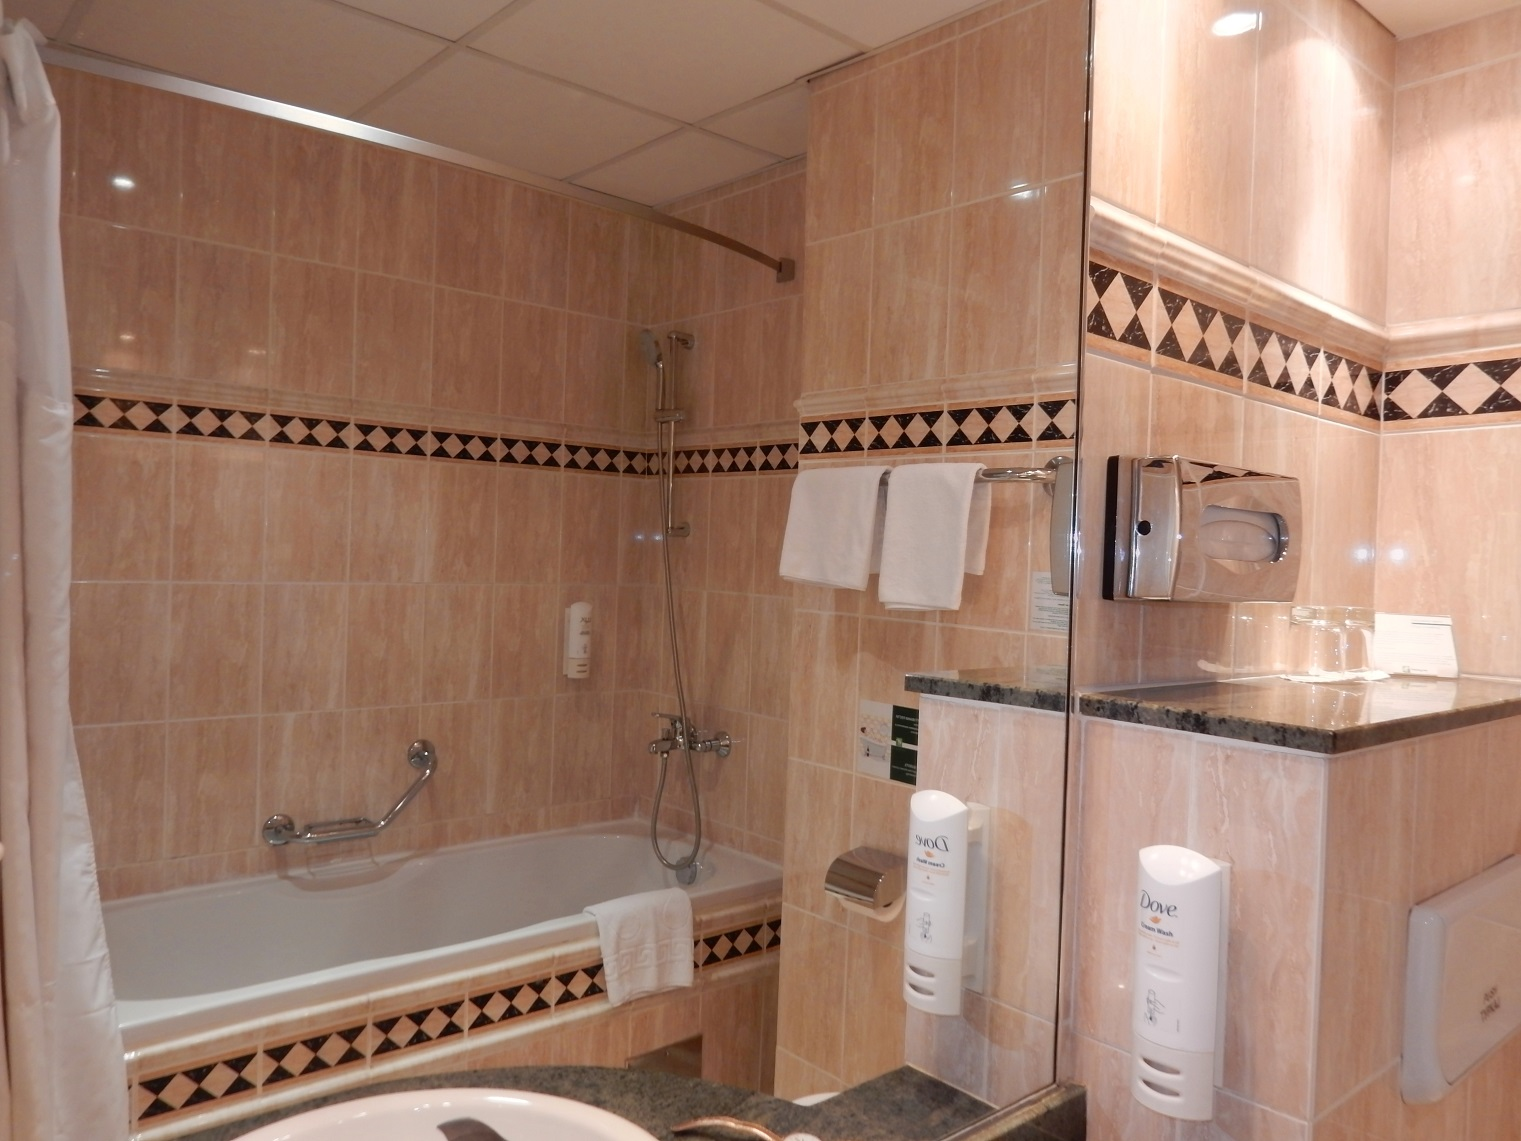 Holiday Inn Skopje Bathroom